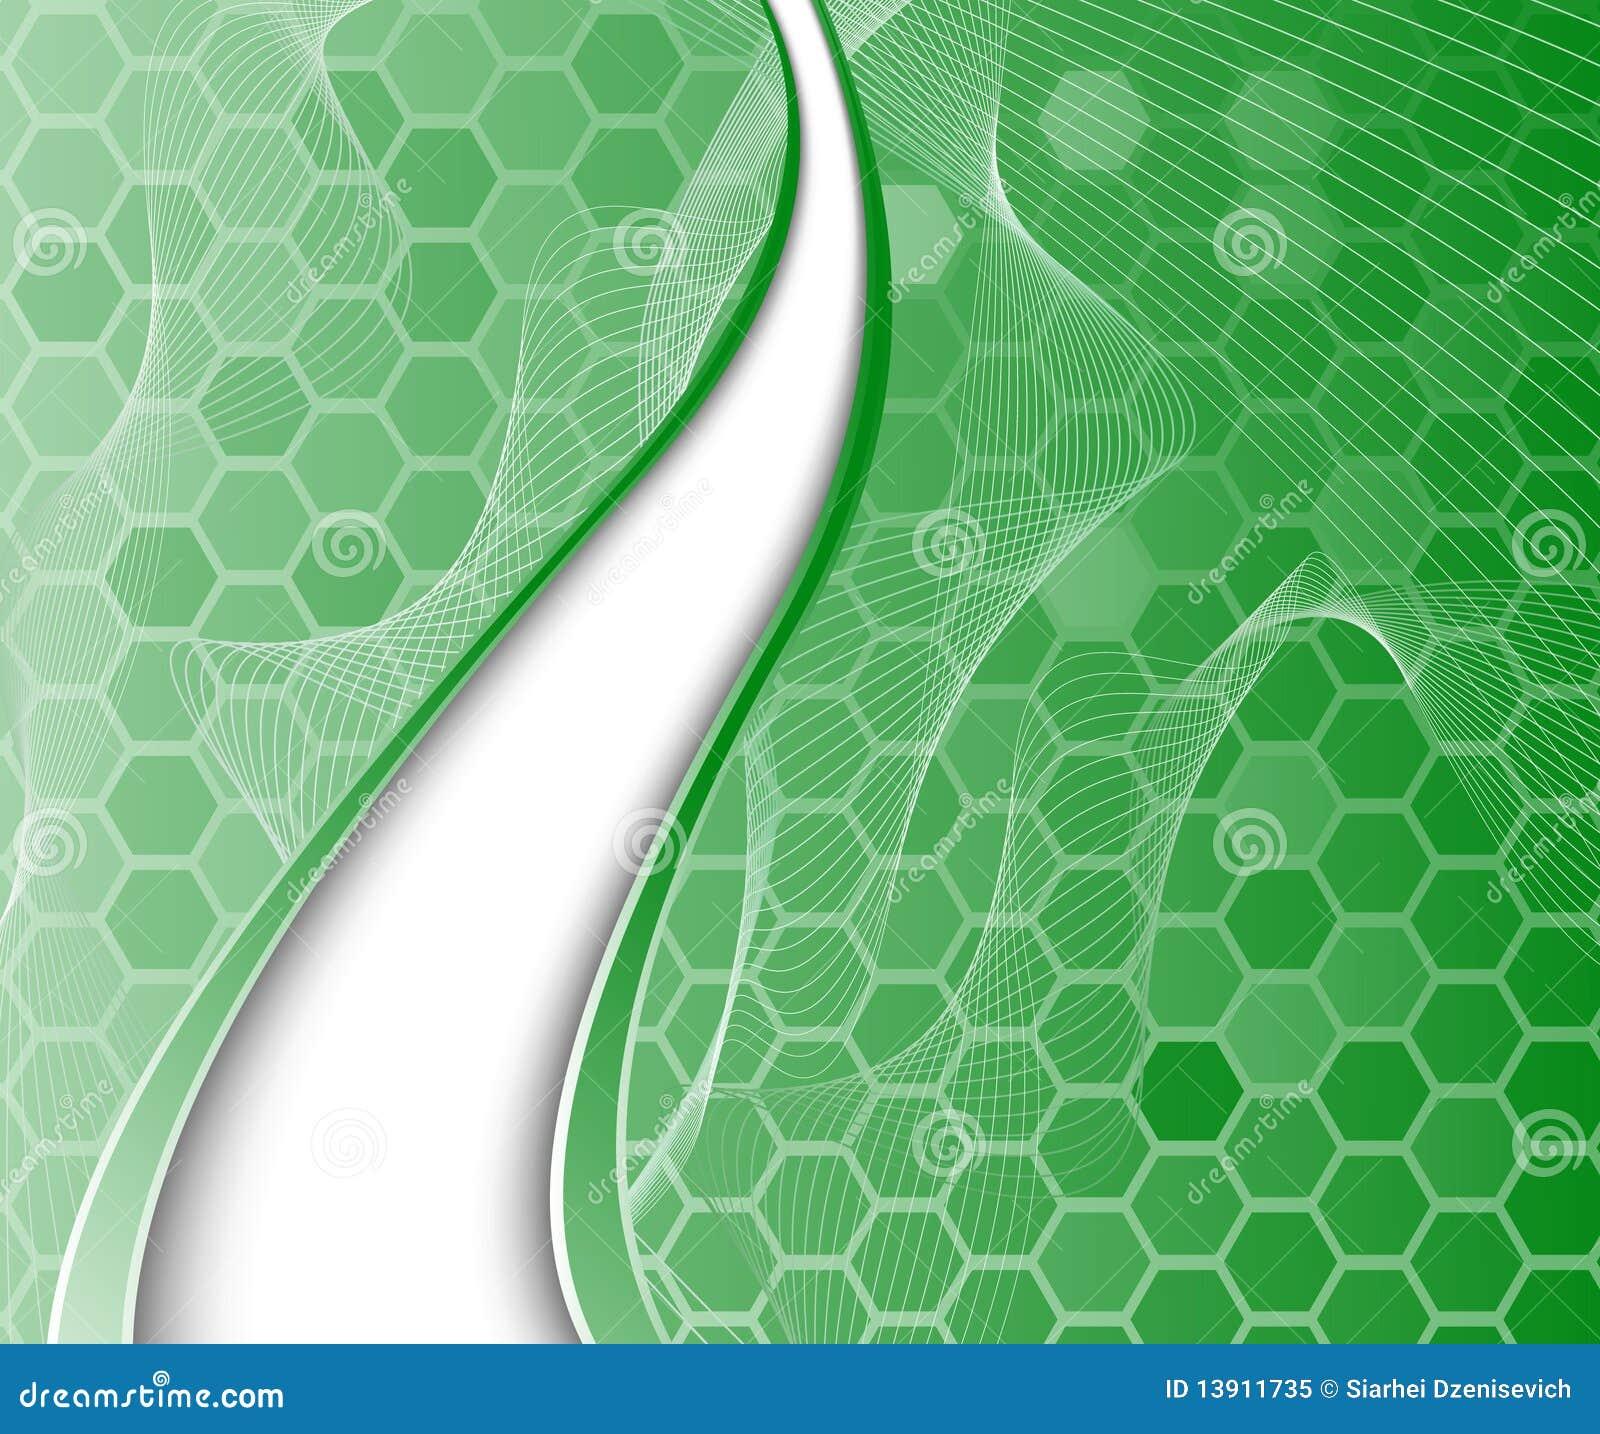 green wave clip art - photo #50